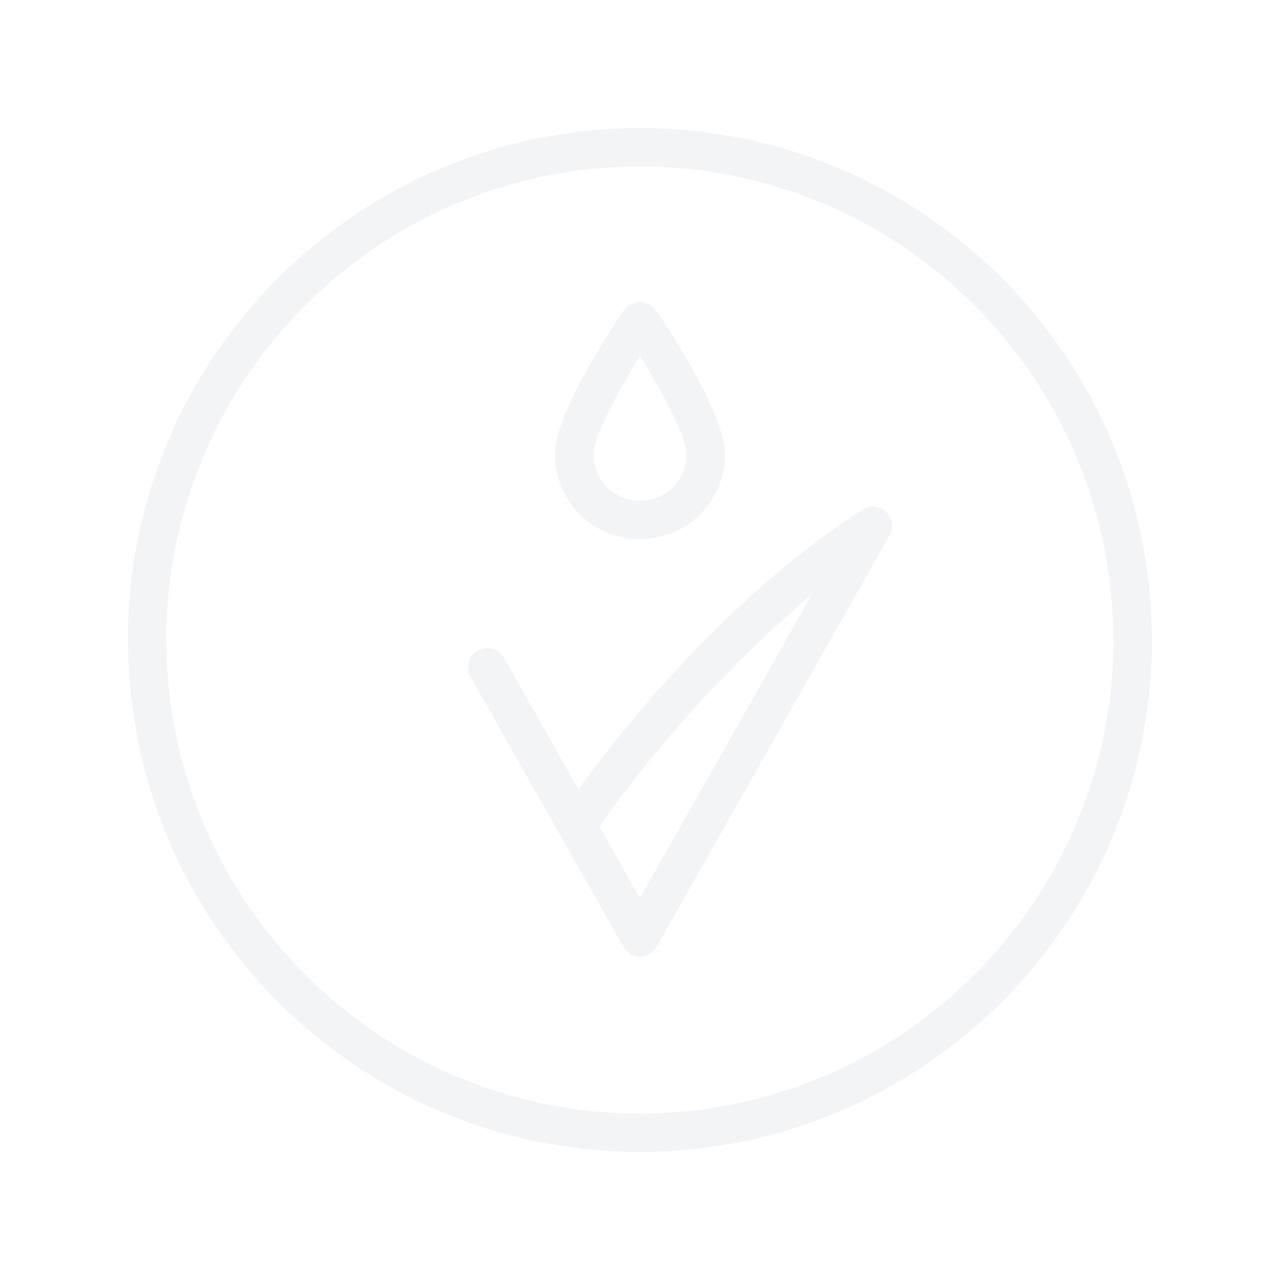 Calvin Klein Euphoria Intense EDT 50ml